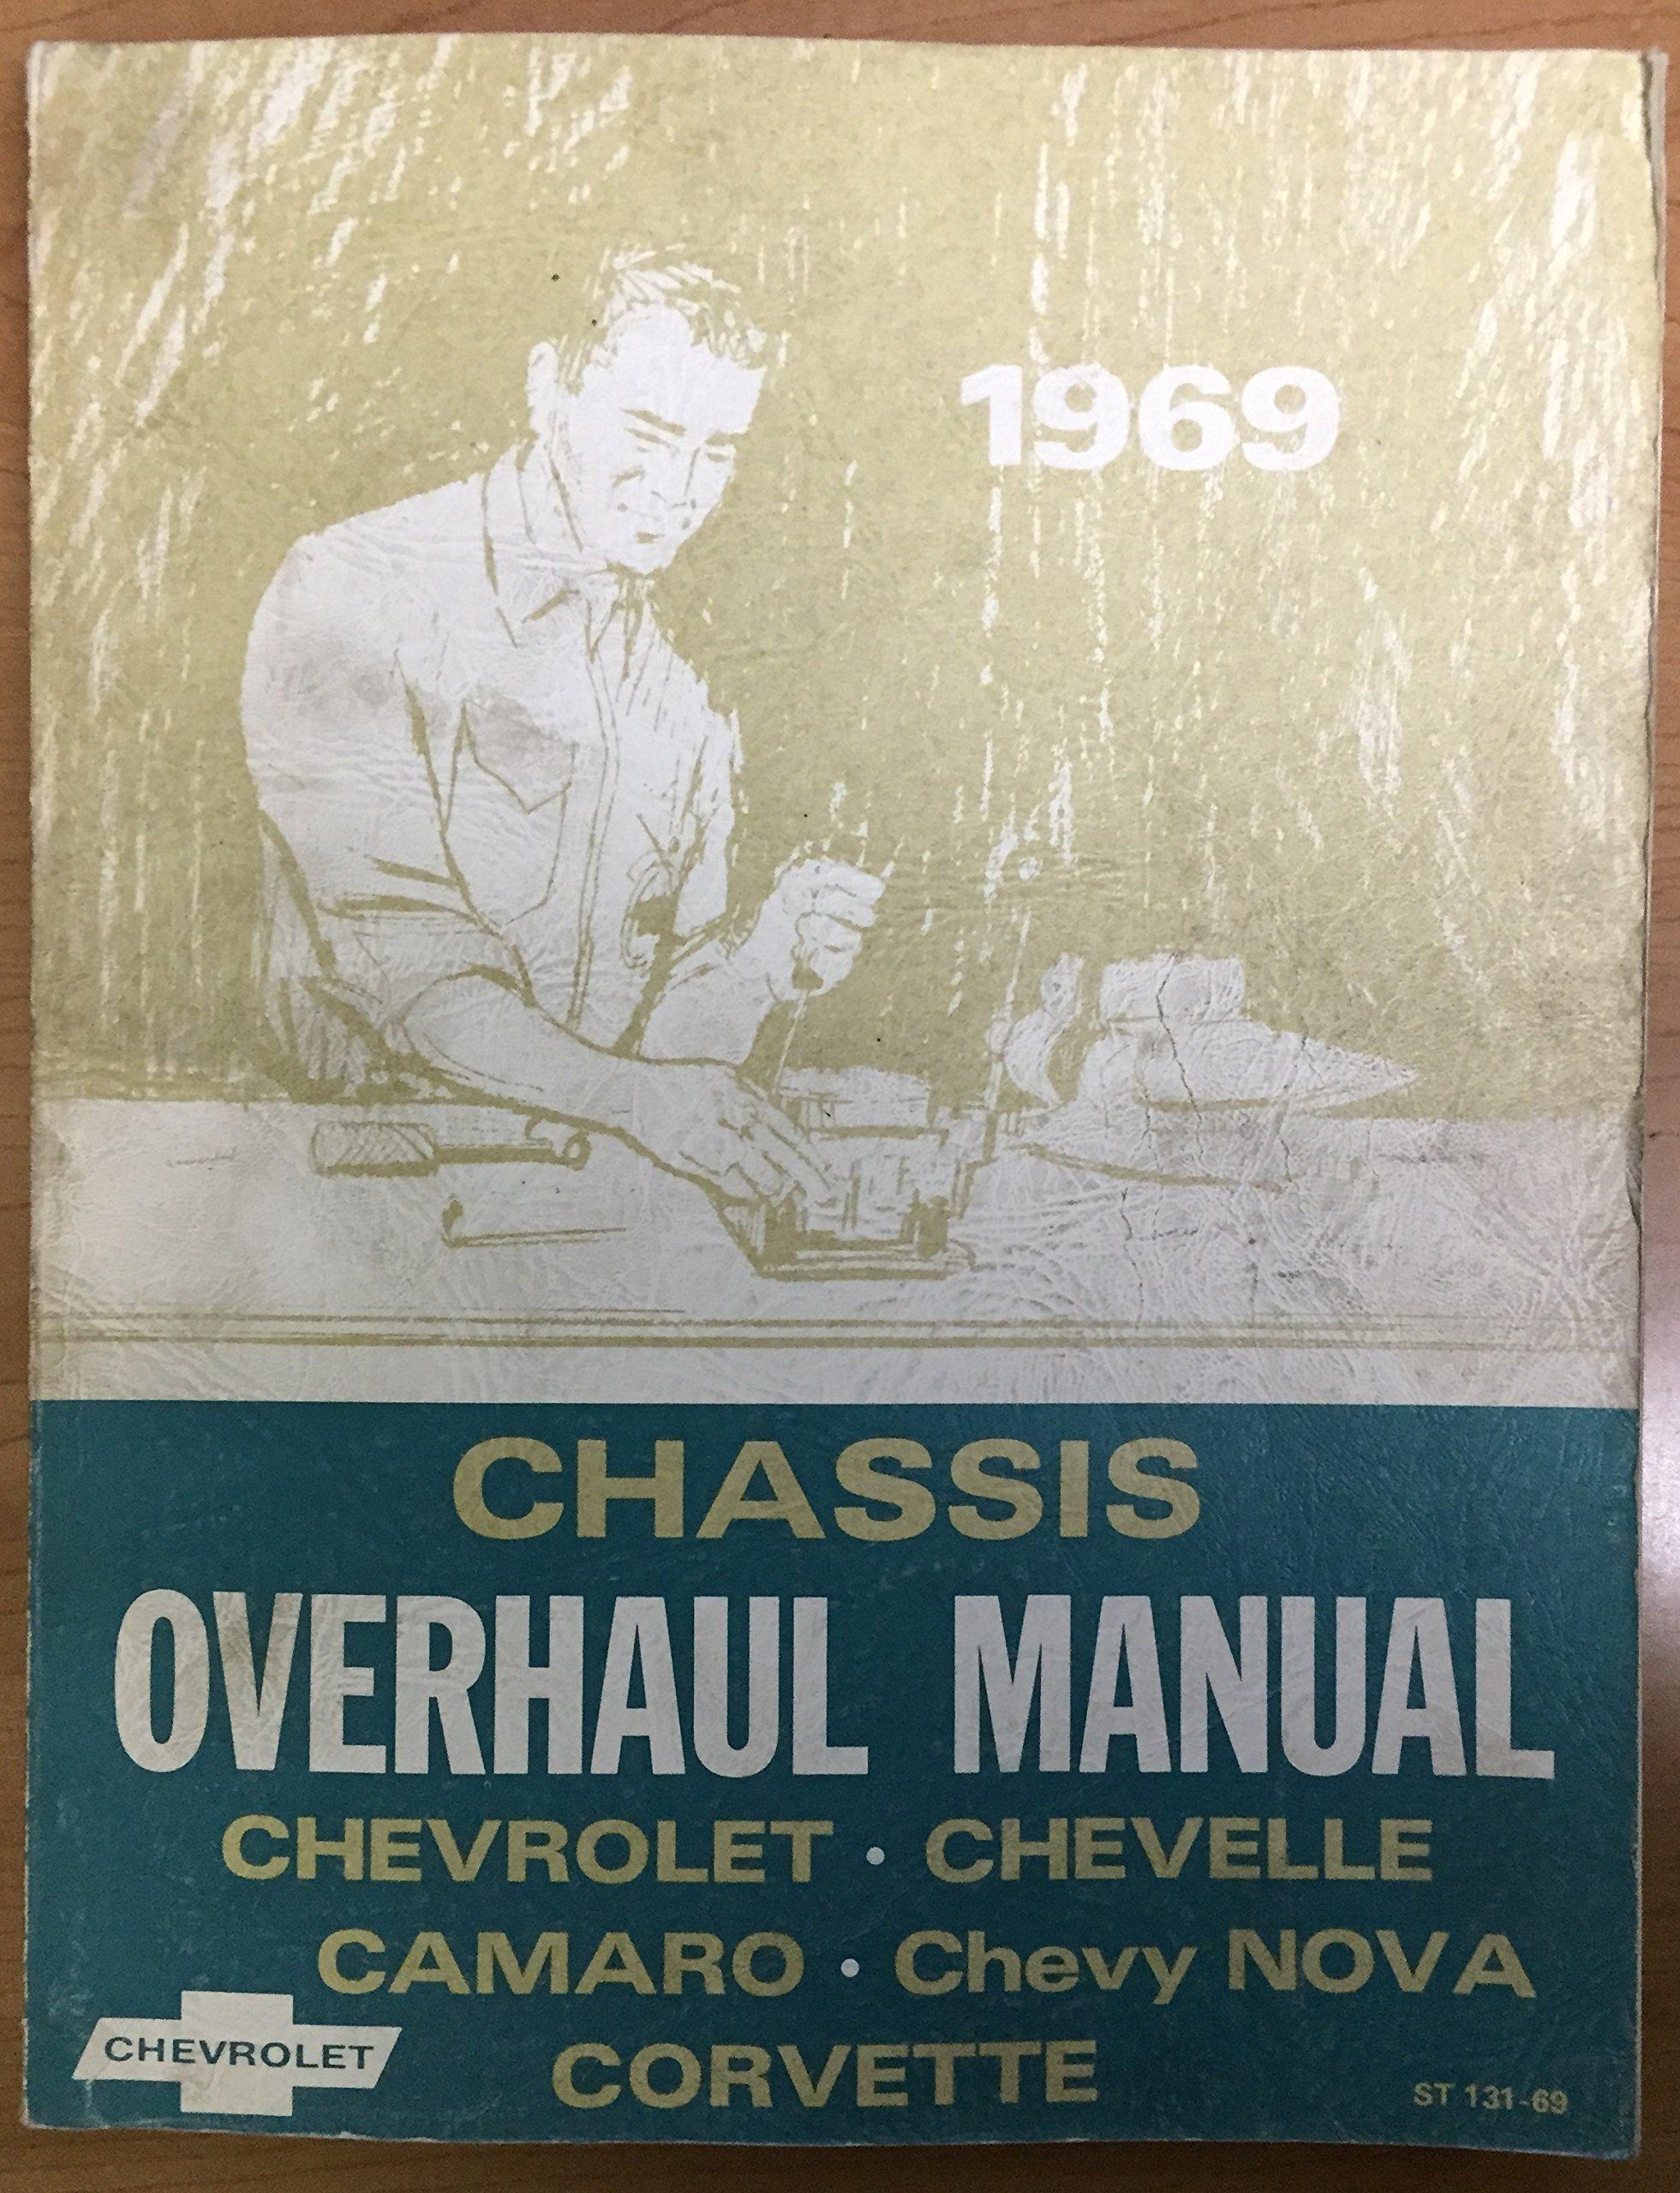 Amazon.com: 1969 Chassis Service Manual Chevrolet Chevelle Camaro Nova  Corvette ST 130-69: Chevrolet Motor Division: Books